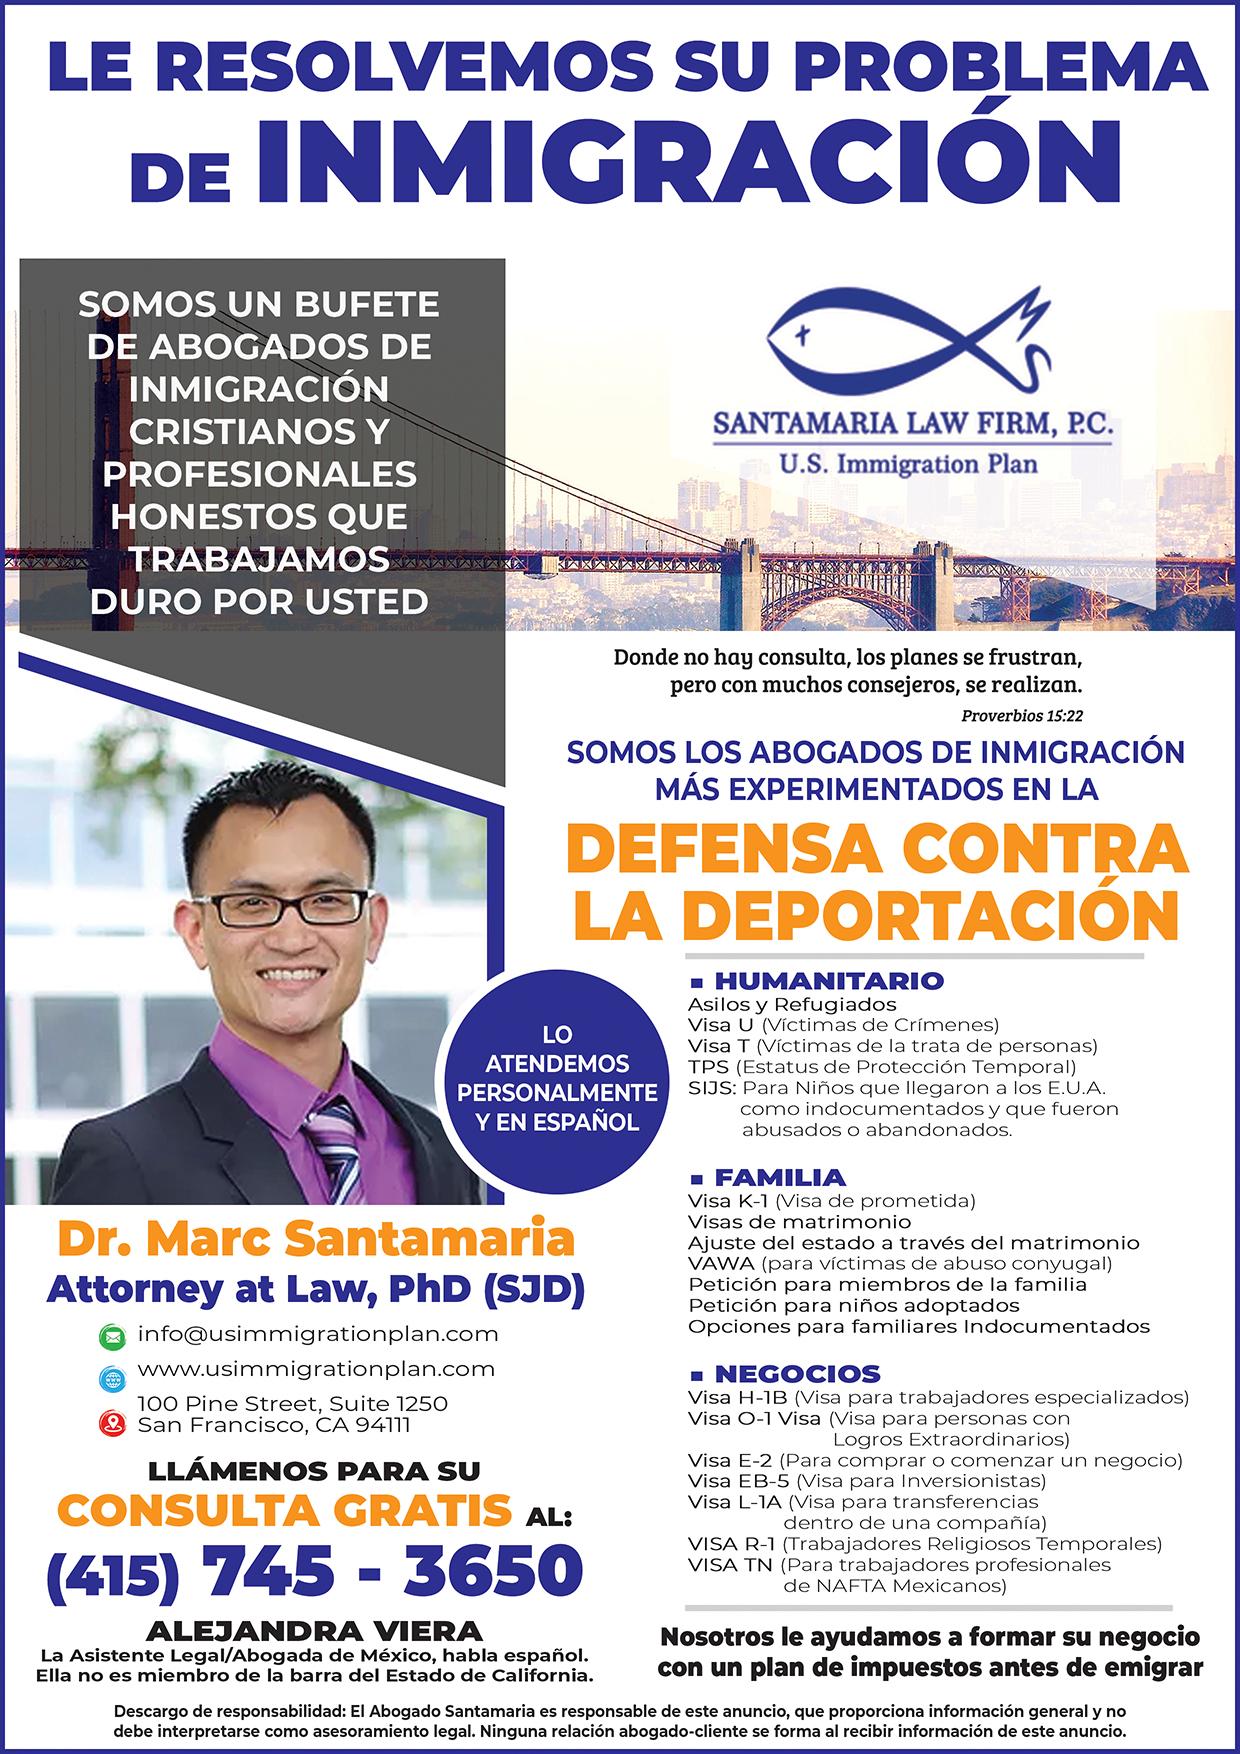 Santamaria Law Firm PC 1 Pag JUNIO 2019 copy.jpg